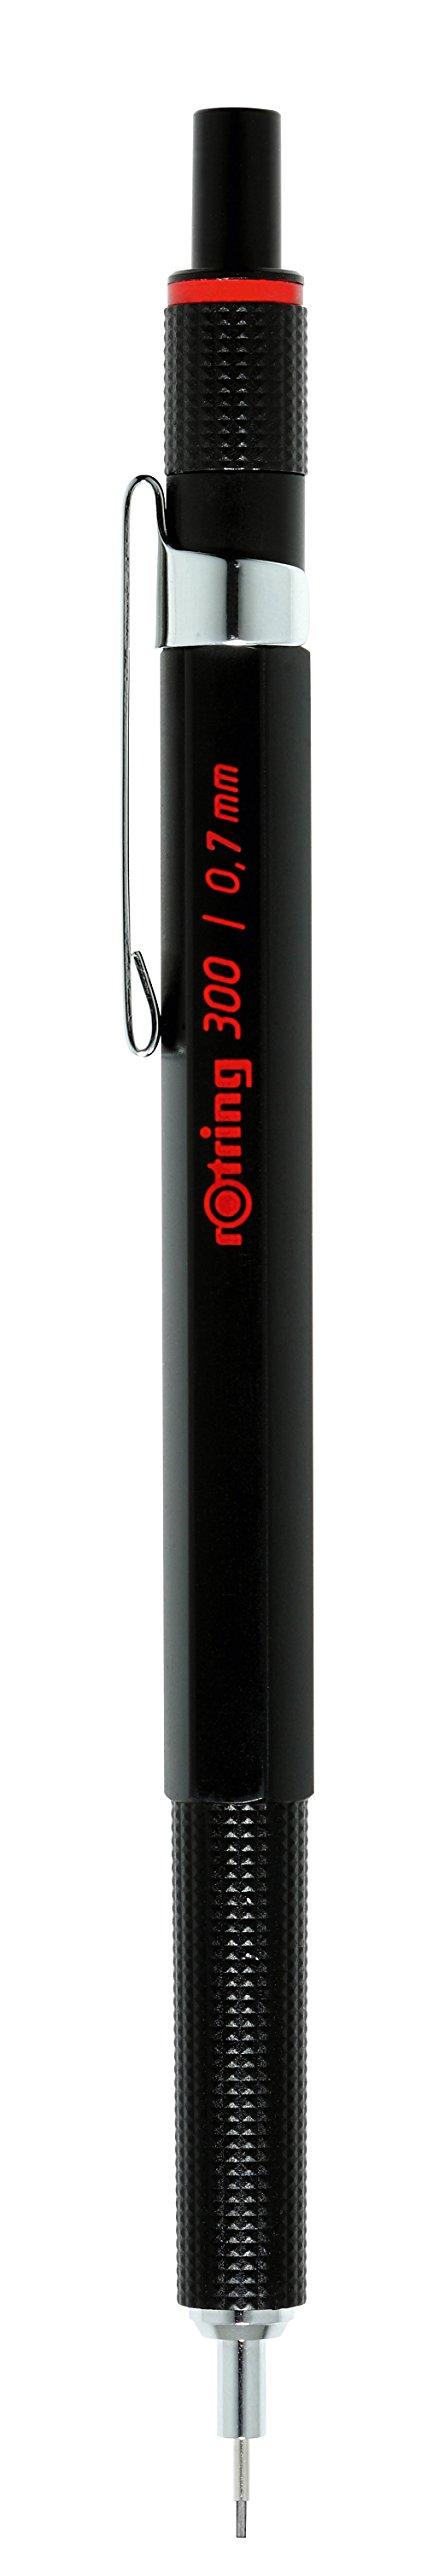 Rotring 300 Portaminas 0,7mm Negro